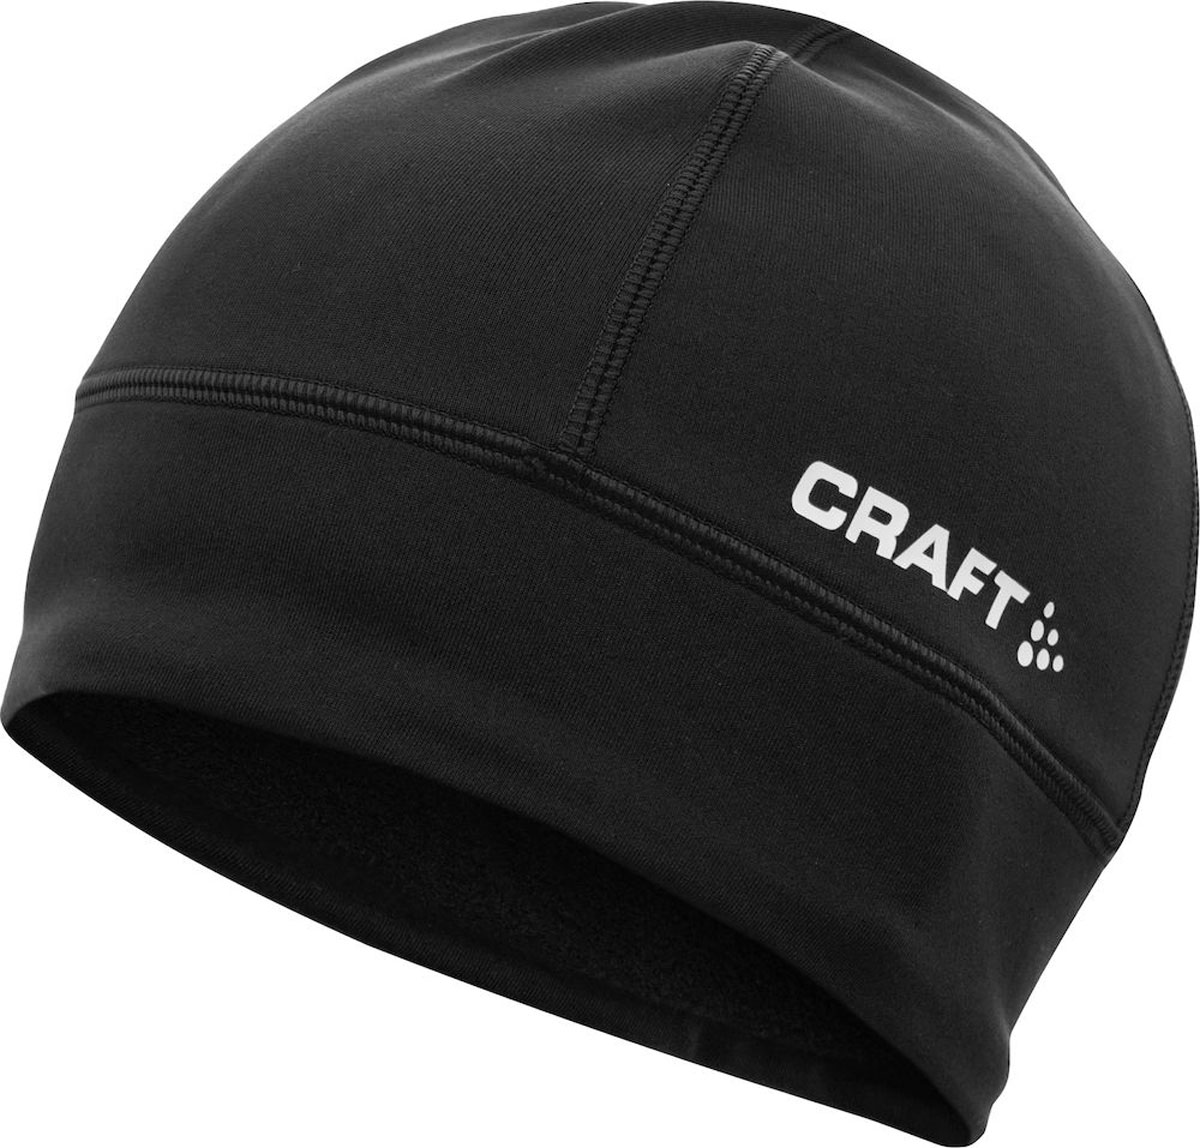 Шапка Craft Light Thermal, цвет: черный. 1902362/9900. Размер S/M (56)1902362/9900Легкая, утепленная шапка